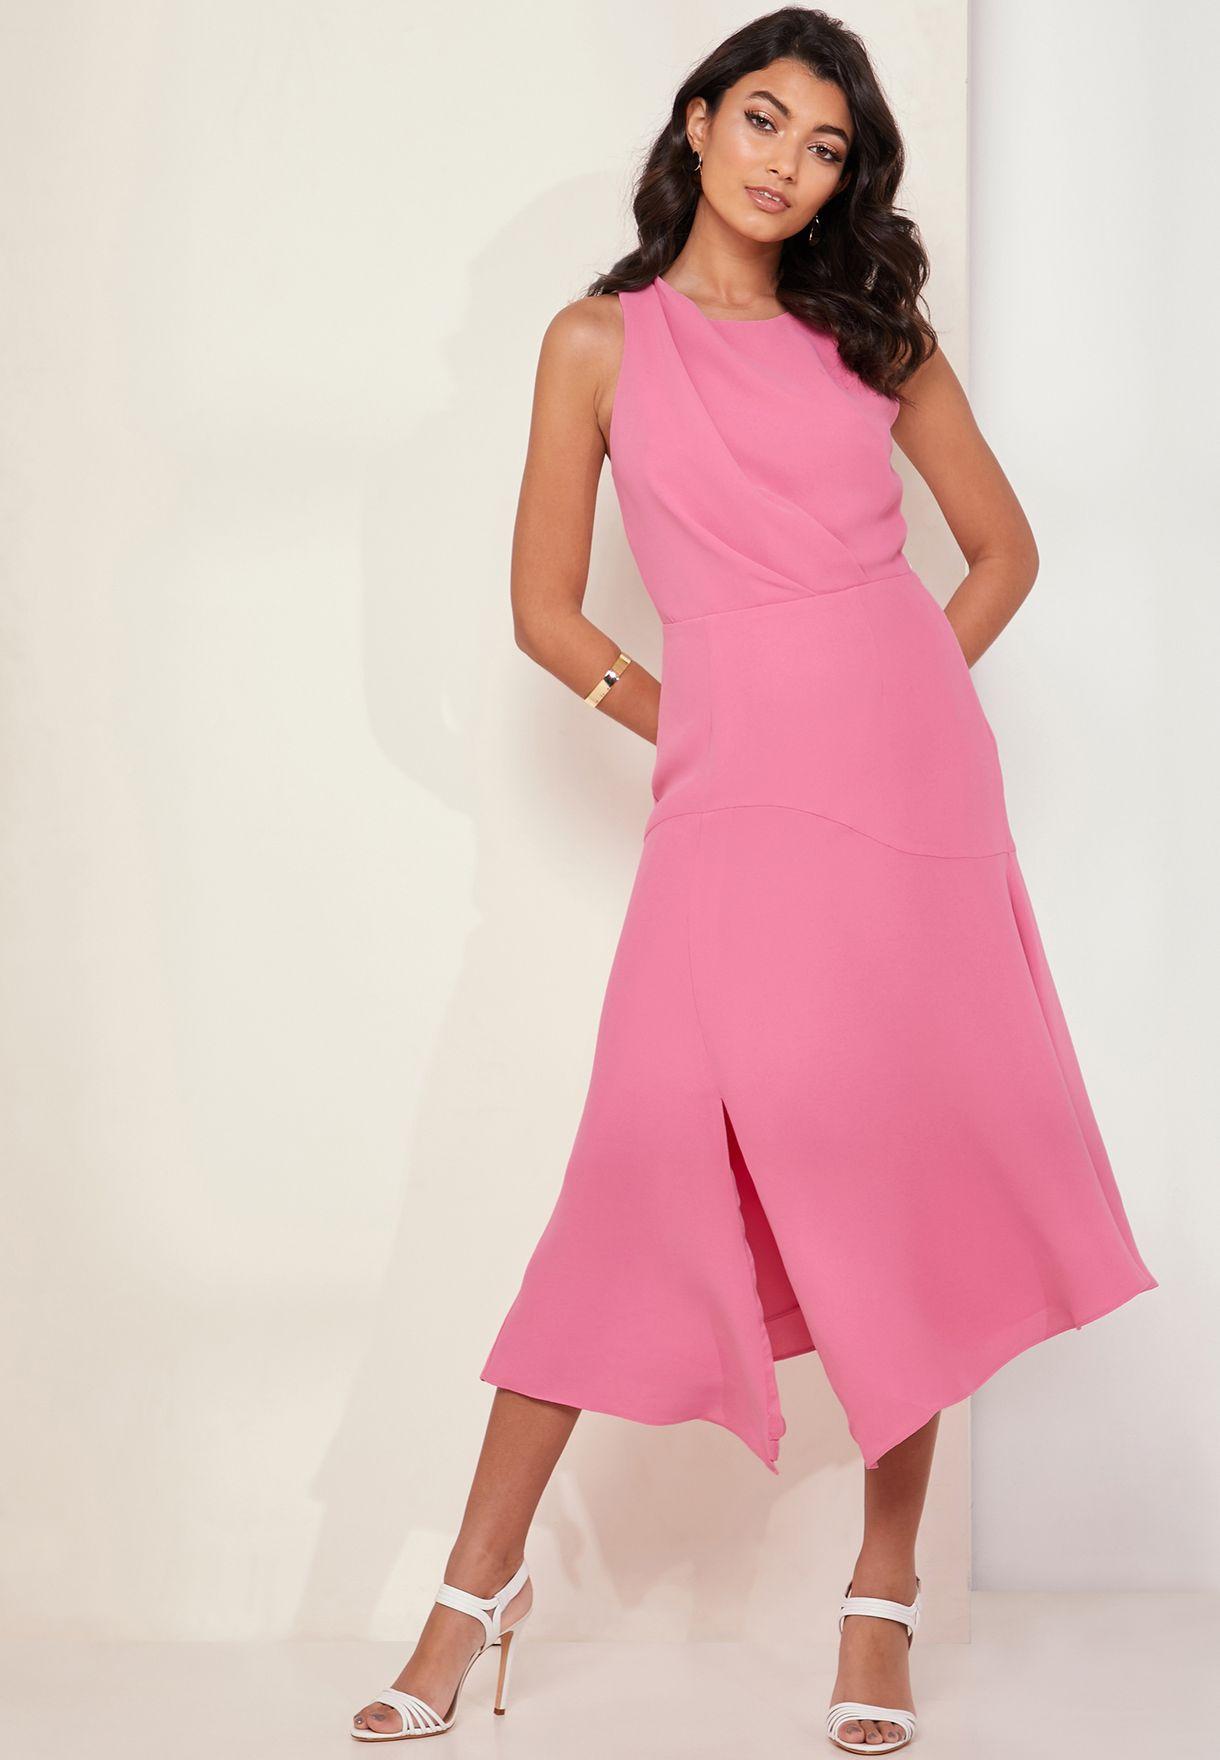 cf6ccd1ed8f Shop Reiss pink Cheyenne Asymmetric Pleated Detail Skater Dress ...